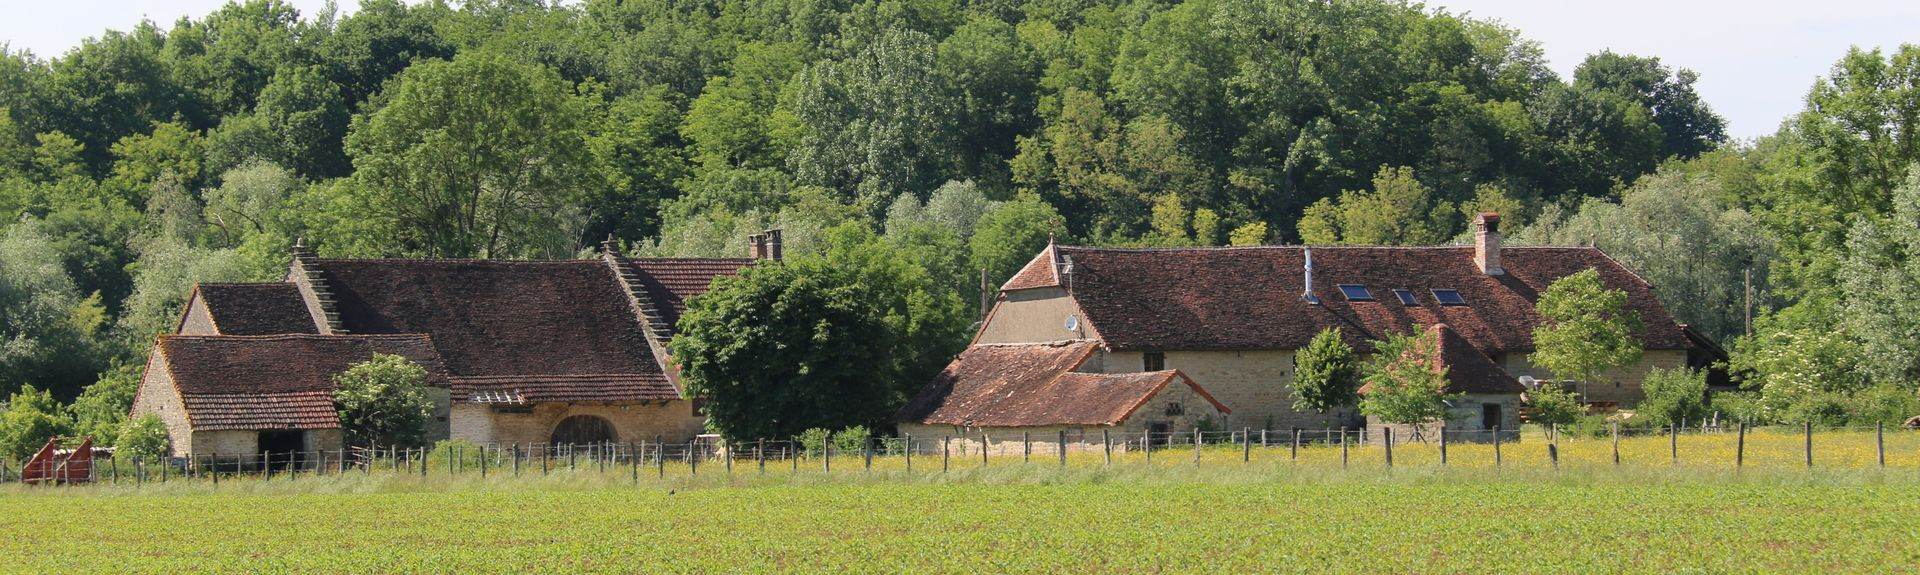 Saint-Didier, Jura, Bourgogne-Franche-Comté, Francja